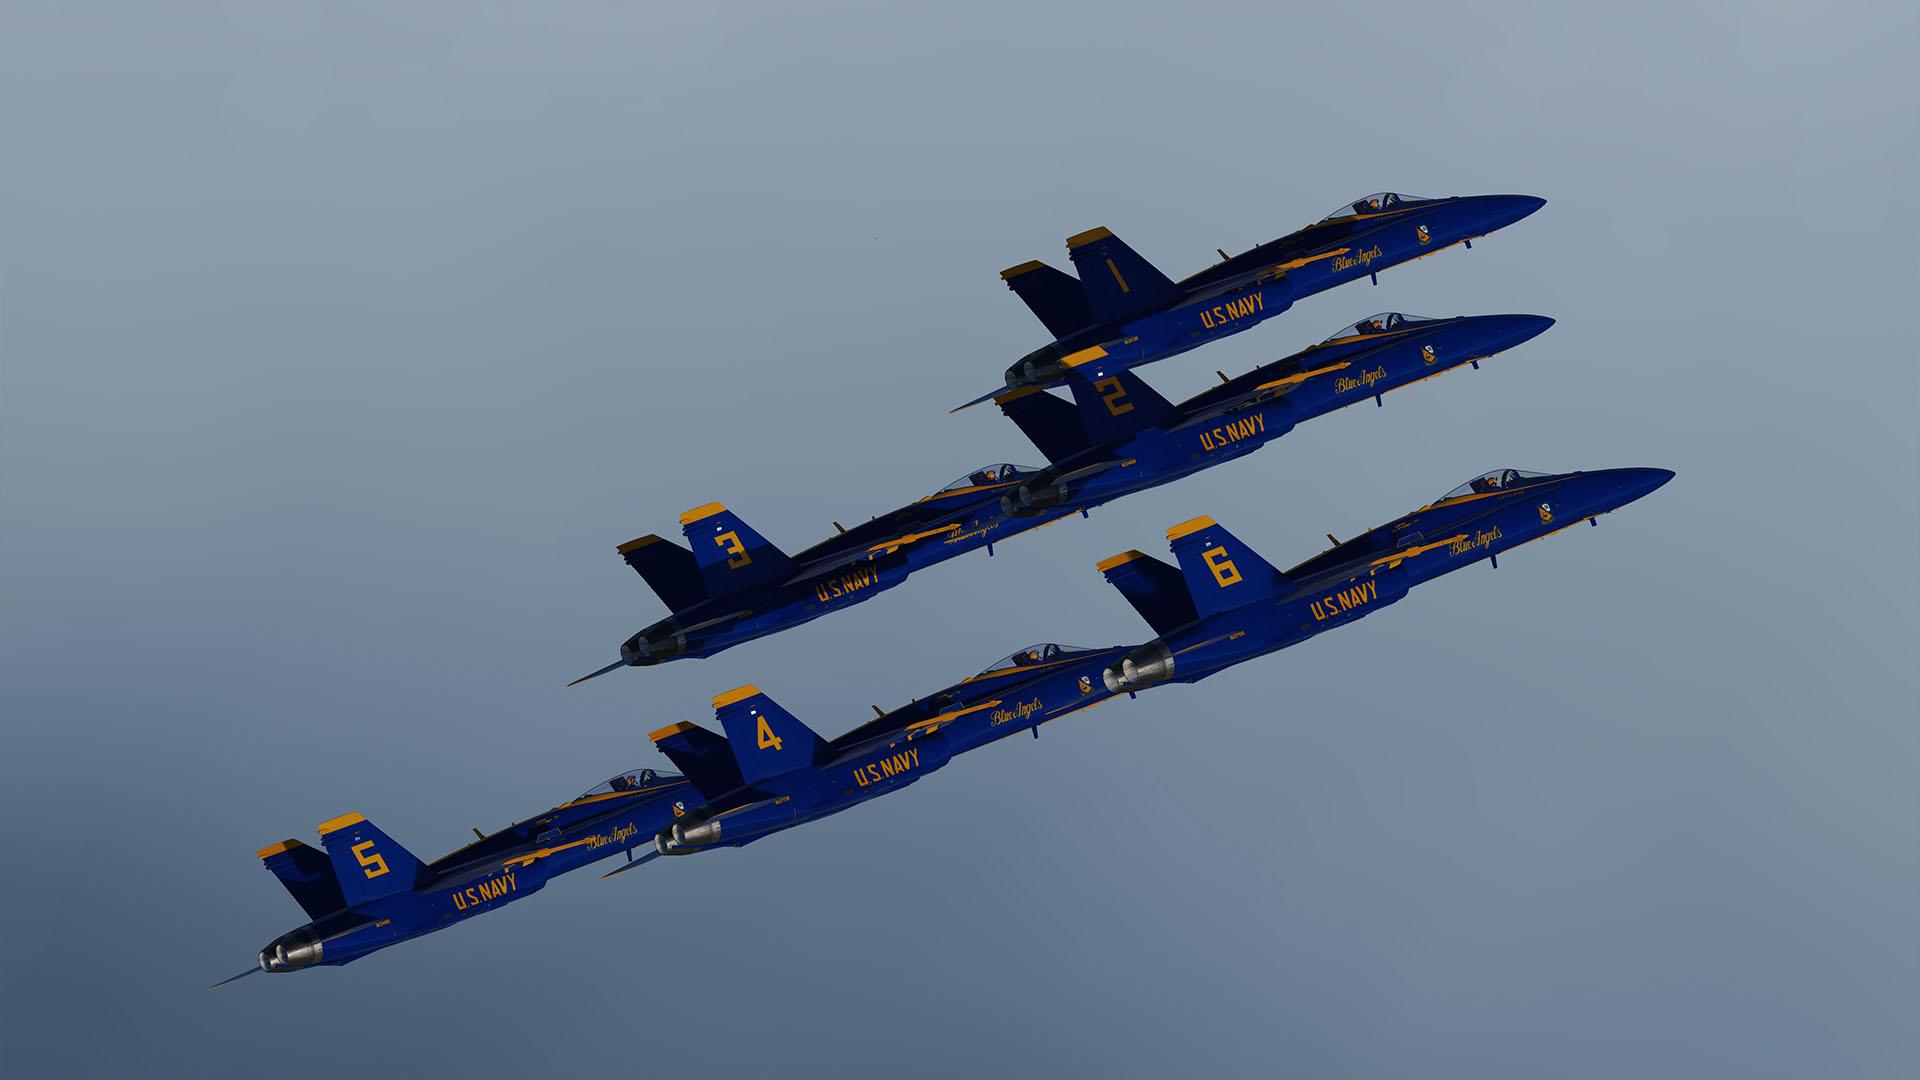 Обои Blue angels, Speed, wallpapers, navy. Авиация foto 16